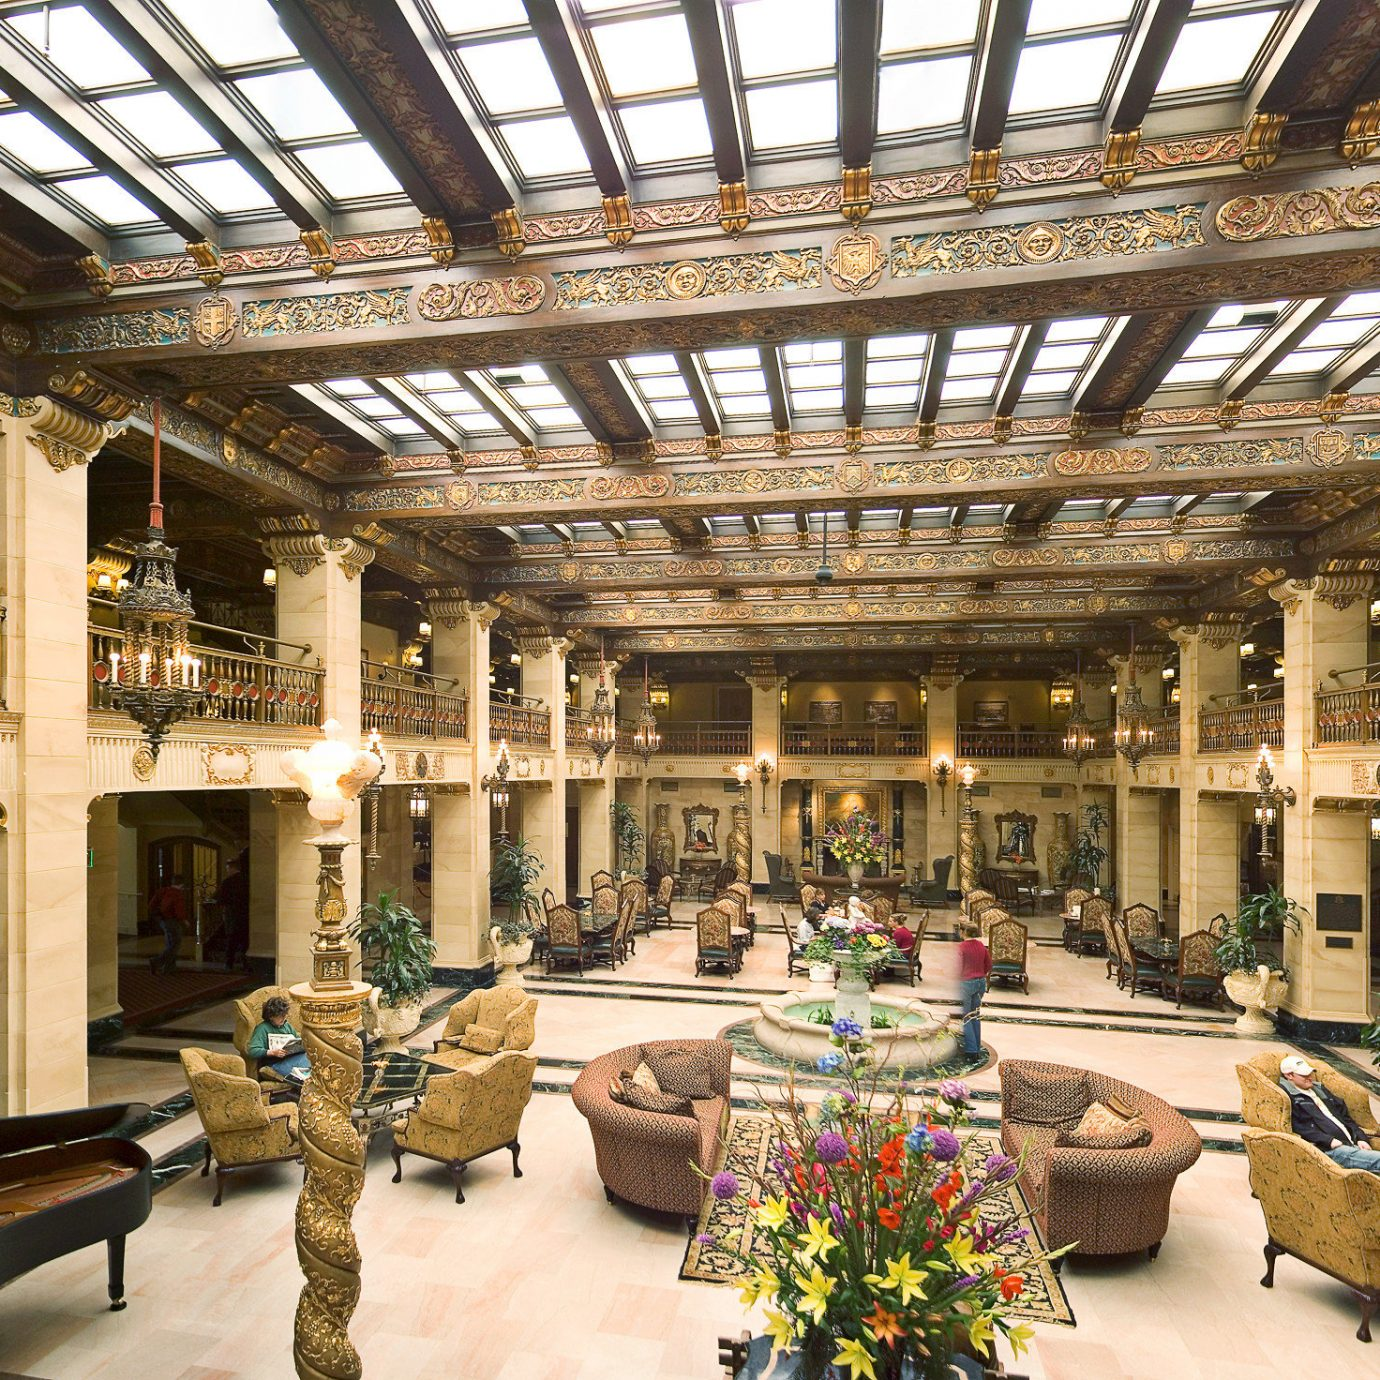 Elegant Historic Lobby Lounge Luxury building palace plaza arcade shopping mall tourist attraction